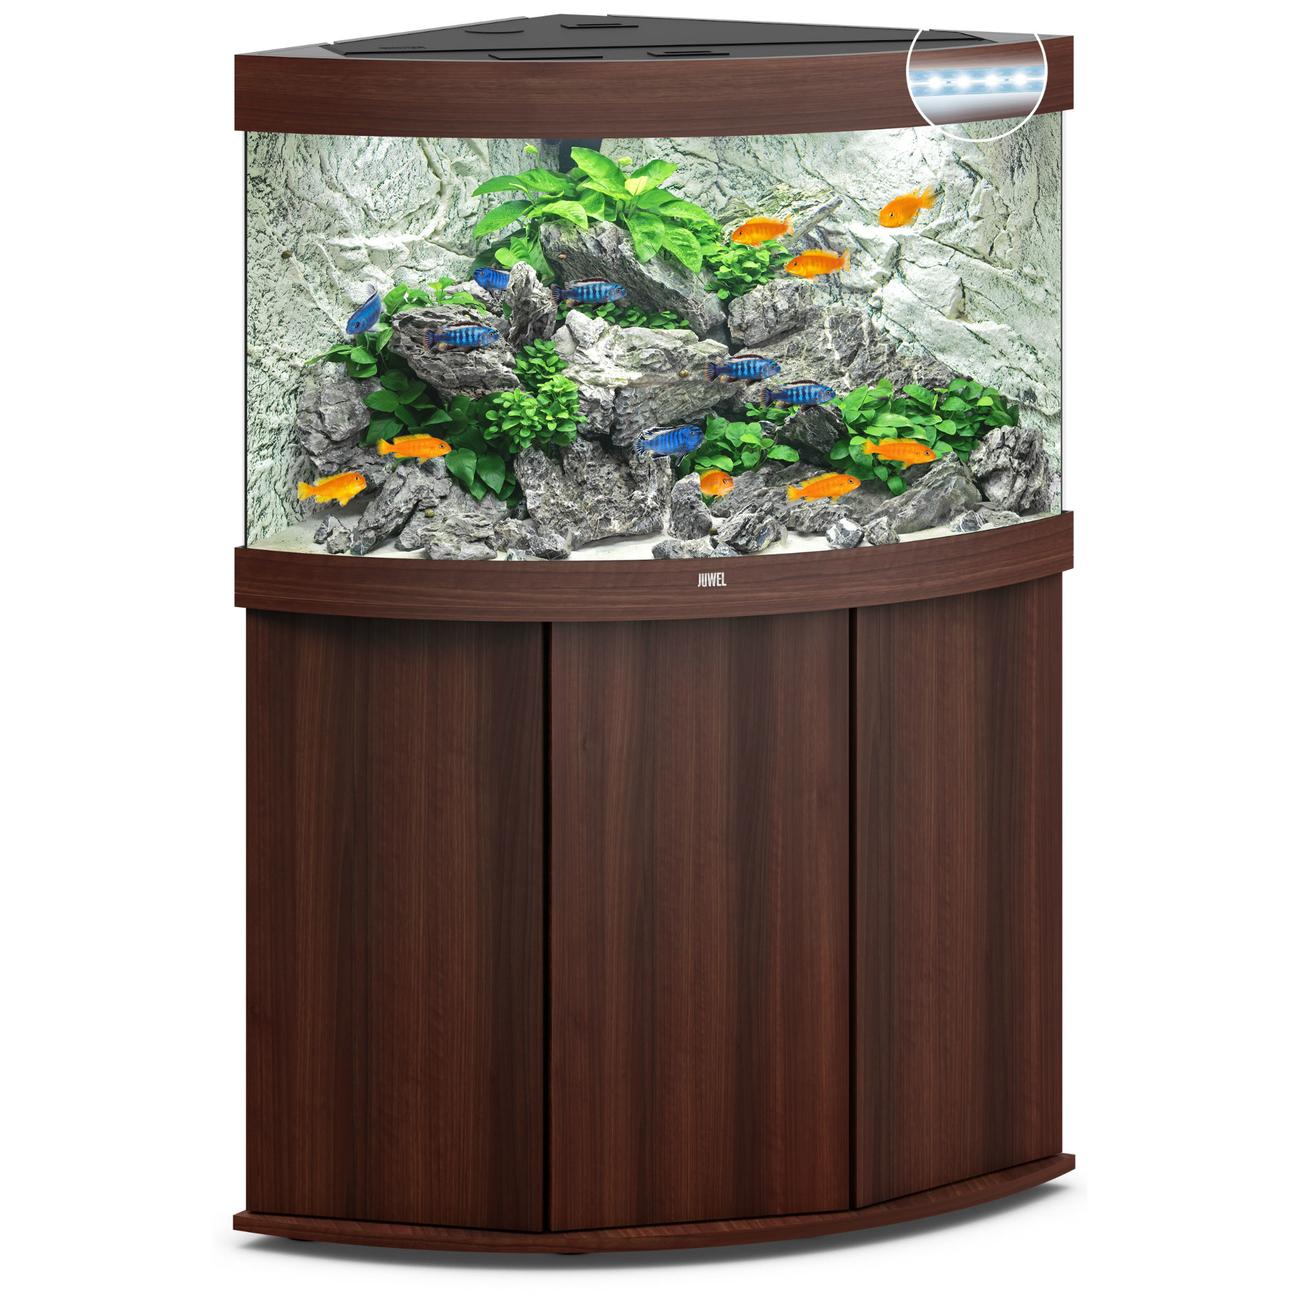 Juwel Trigon 190 LED Eck-Aquarium mit Unterschrank Bild 15